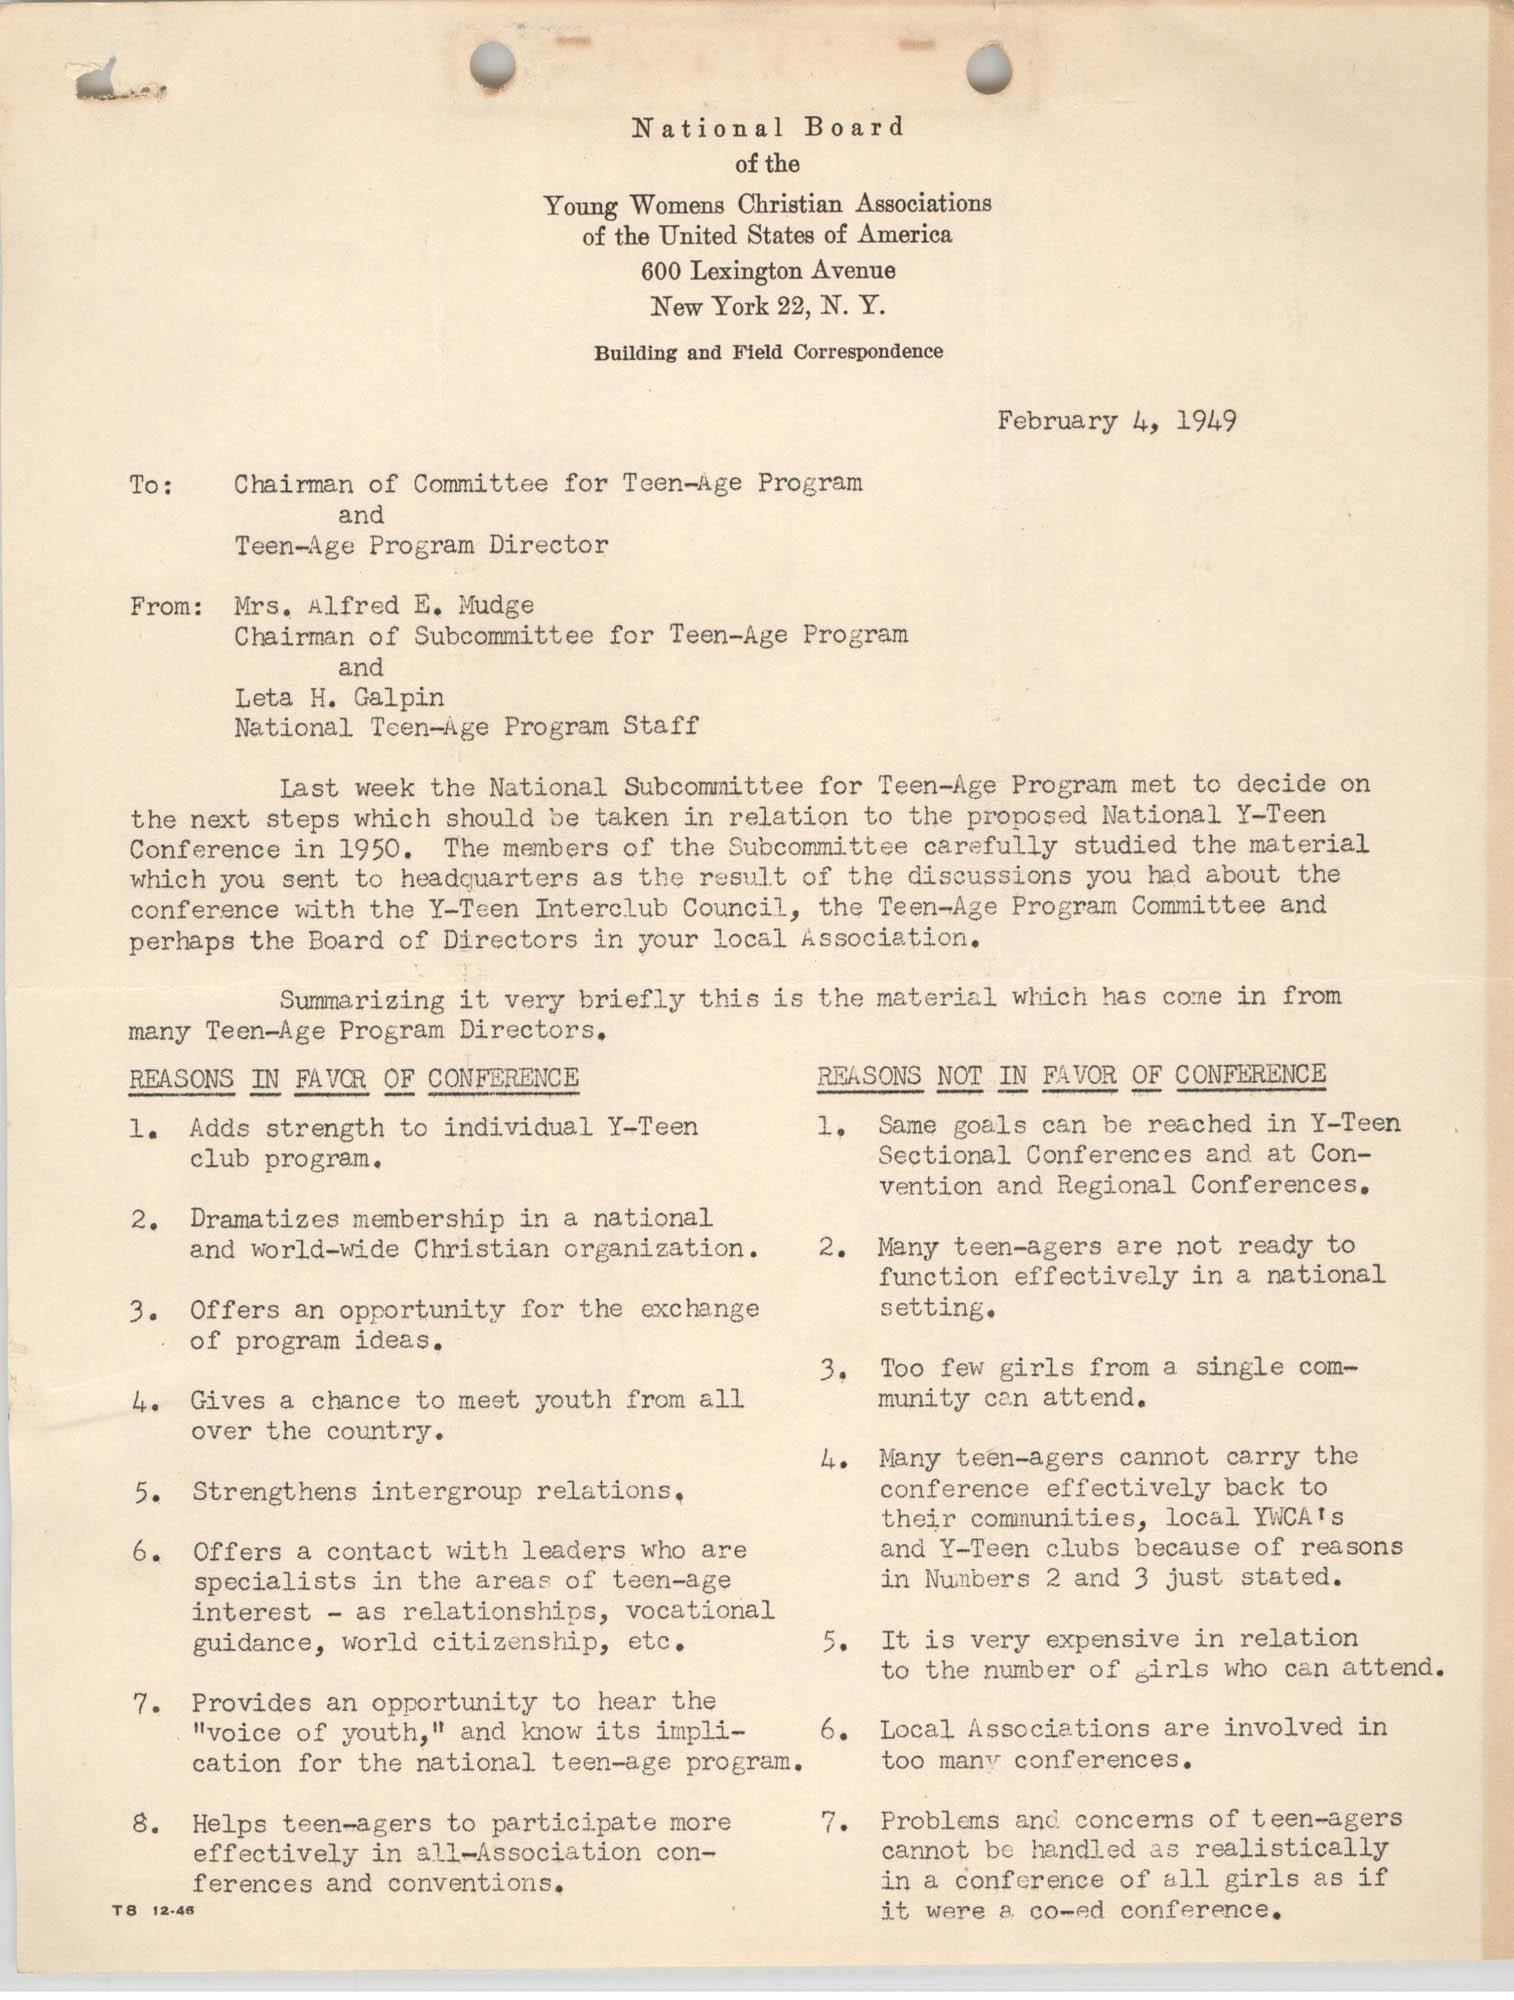 National Board of the Y.W.C.A. Memorandum, February 4, 1949